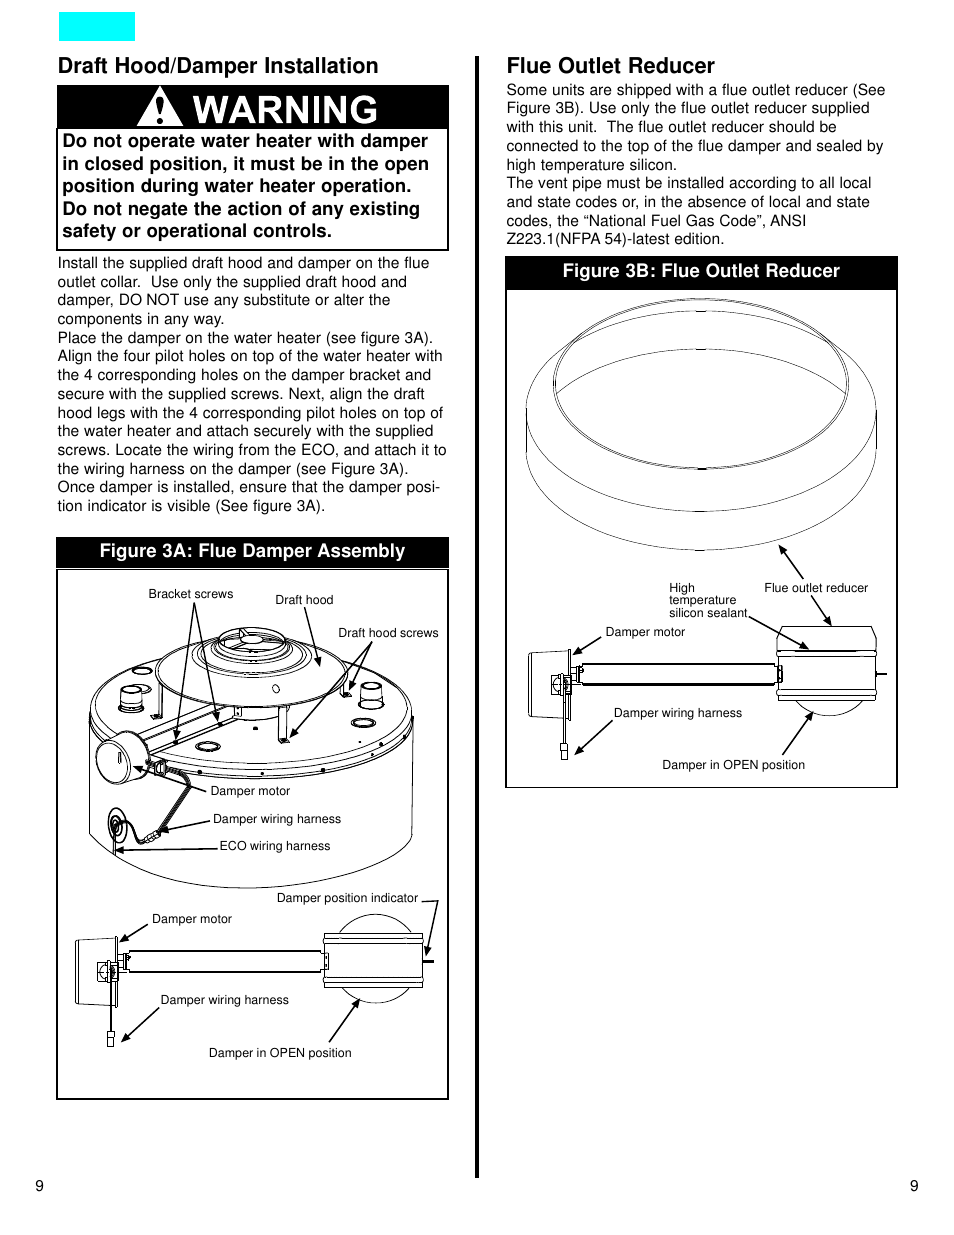 medium resolution of draft hood damper installation flue outlet reducer american water heater dcg user manual page 9 26